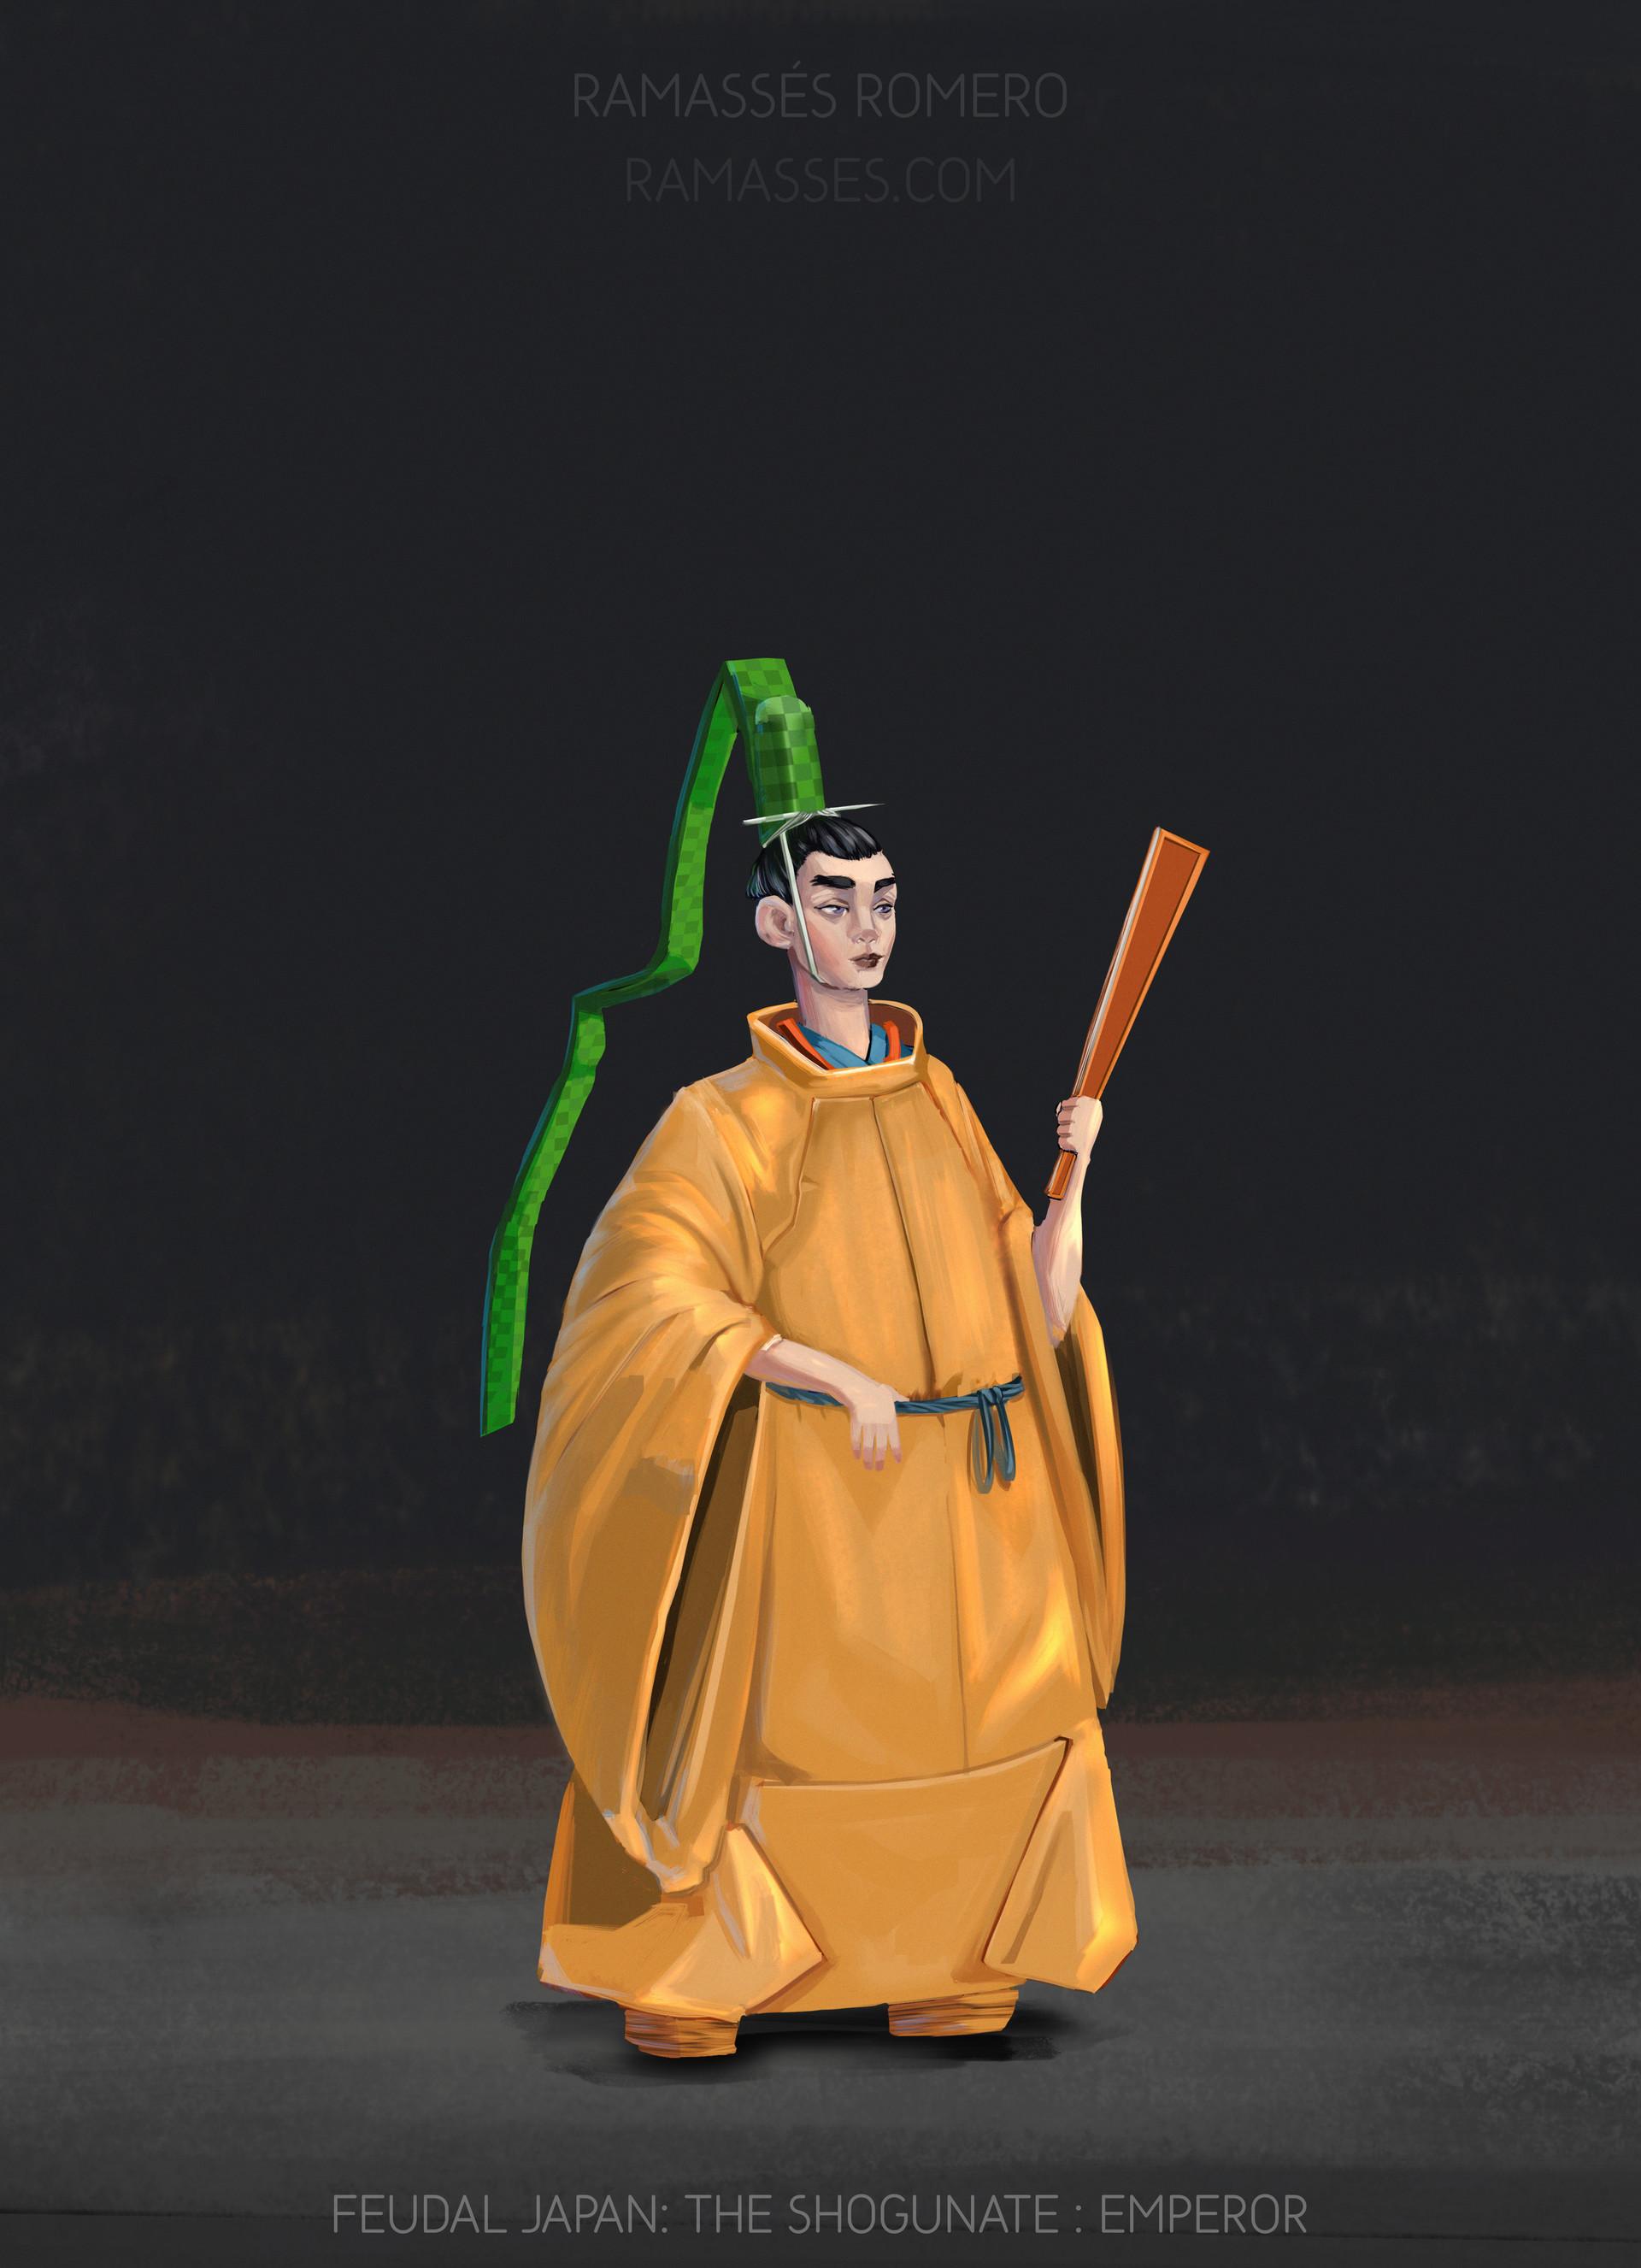 Ramasses romero shogunateexport emperor